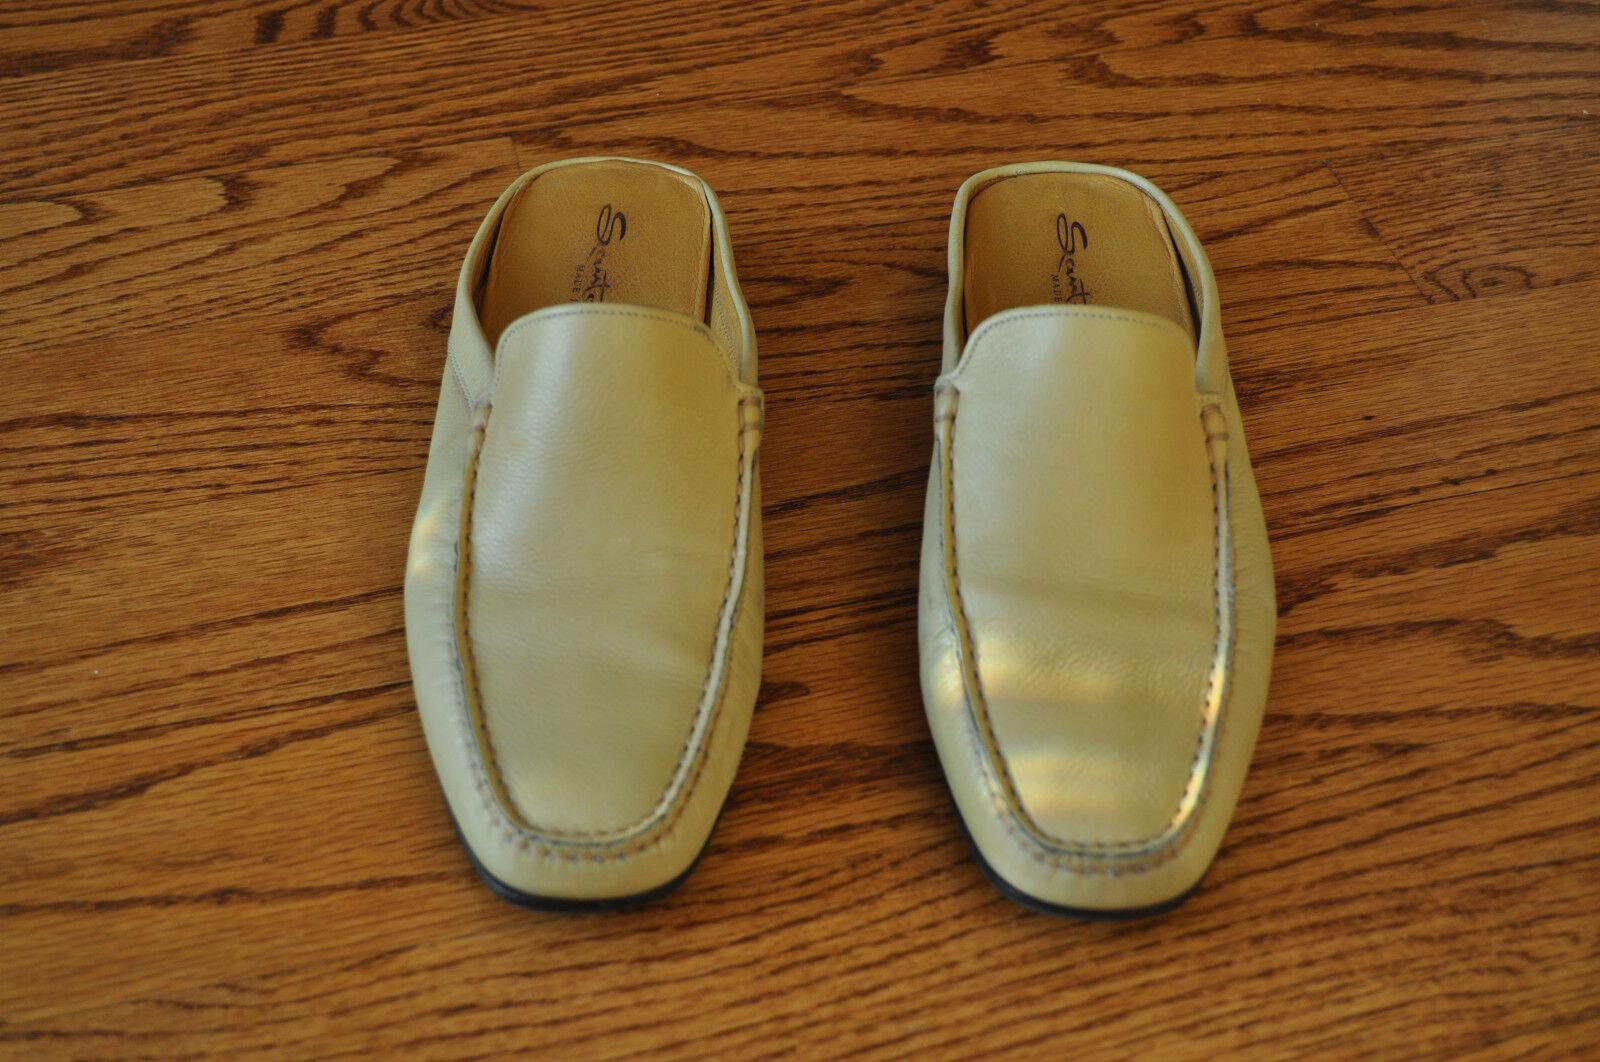 Damenschuhe SANTOM Beige Leder Flats Schuhes Größe 7.5 M MADE IN ITALY